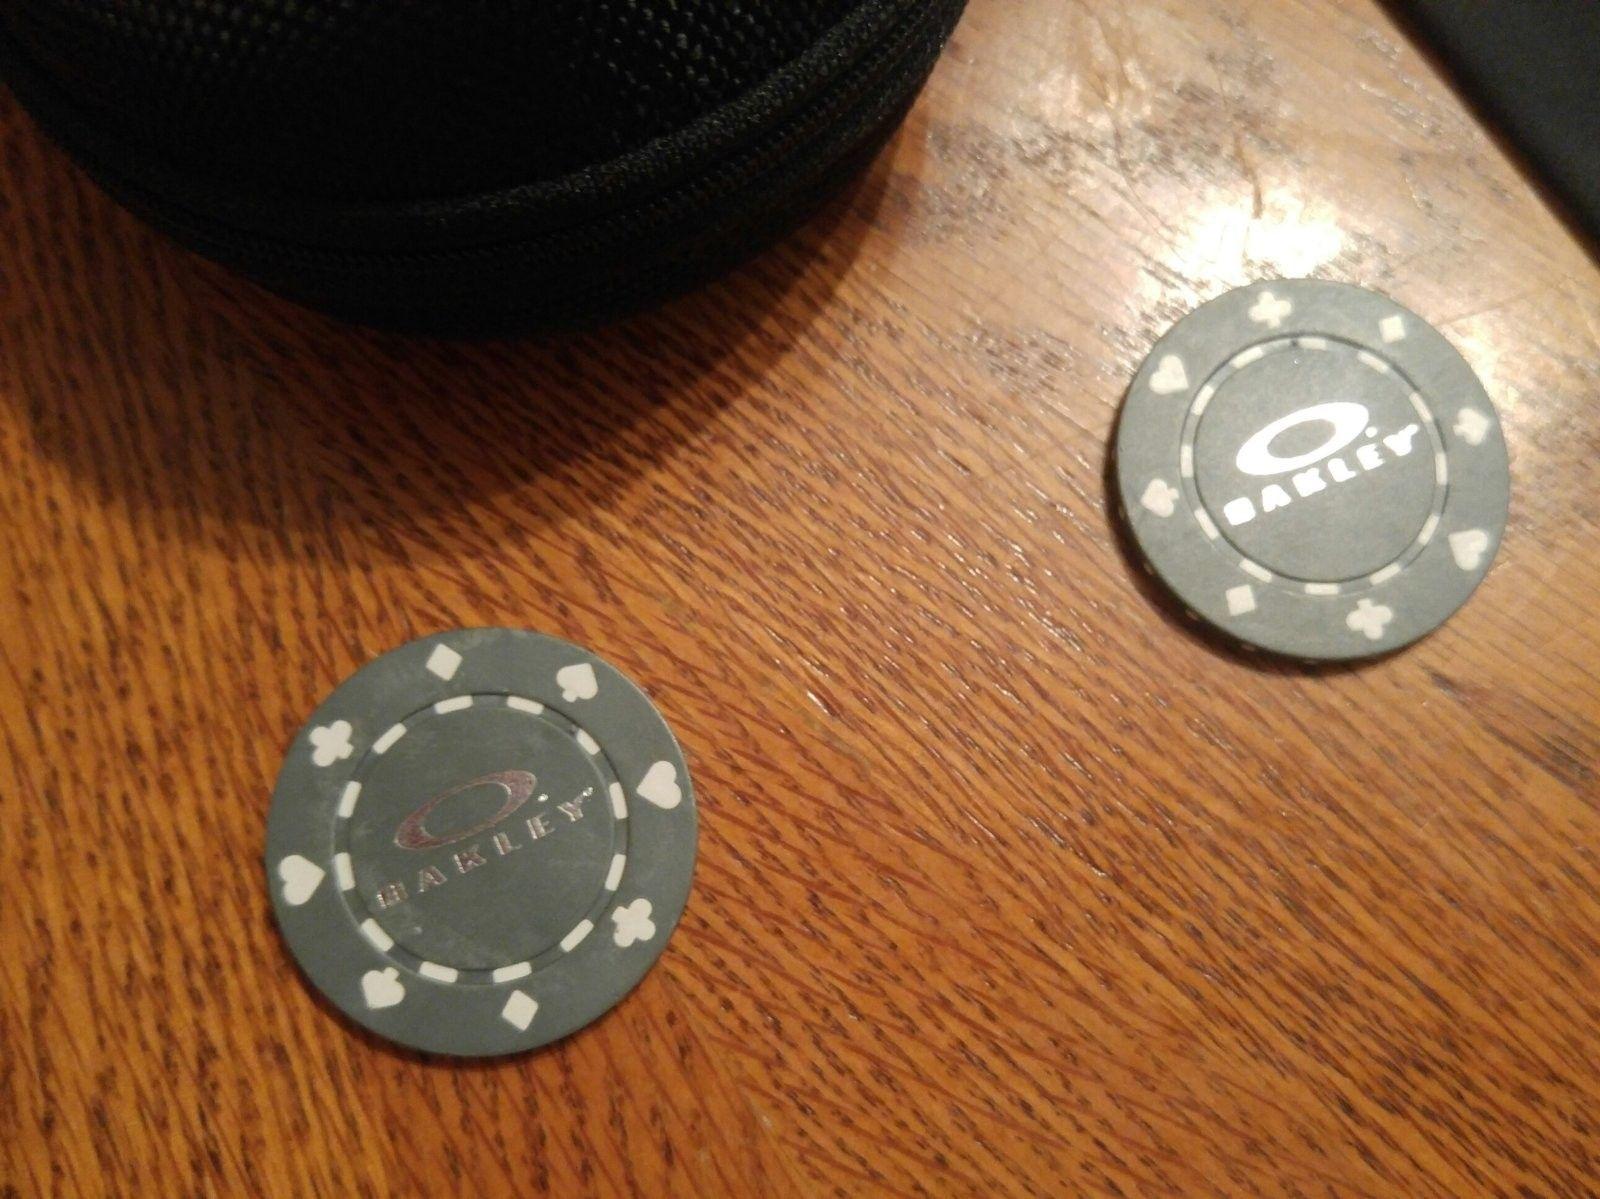 Watch vault/poker chips - 20160707_150005-1.jpg